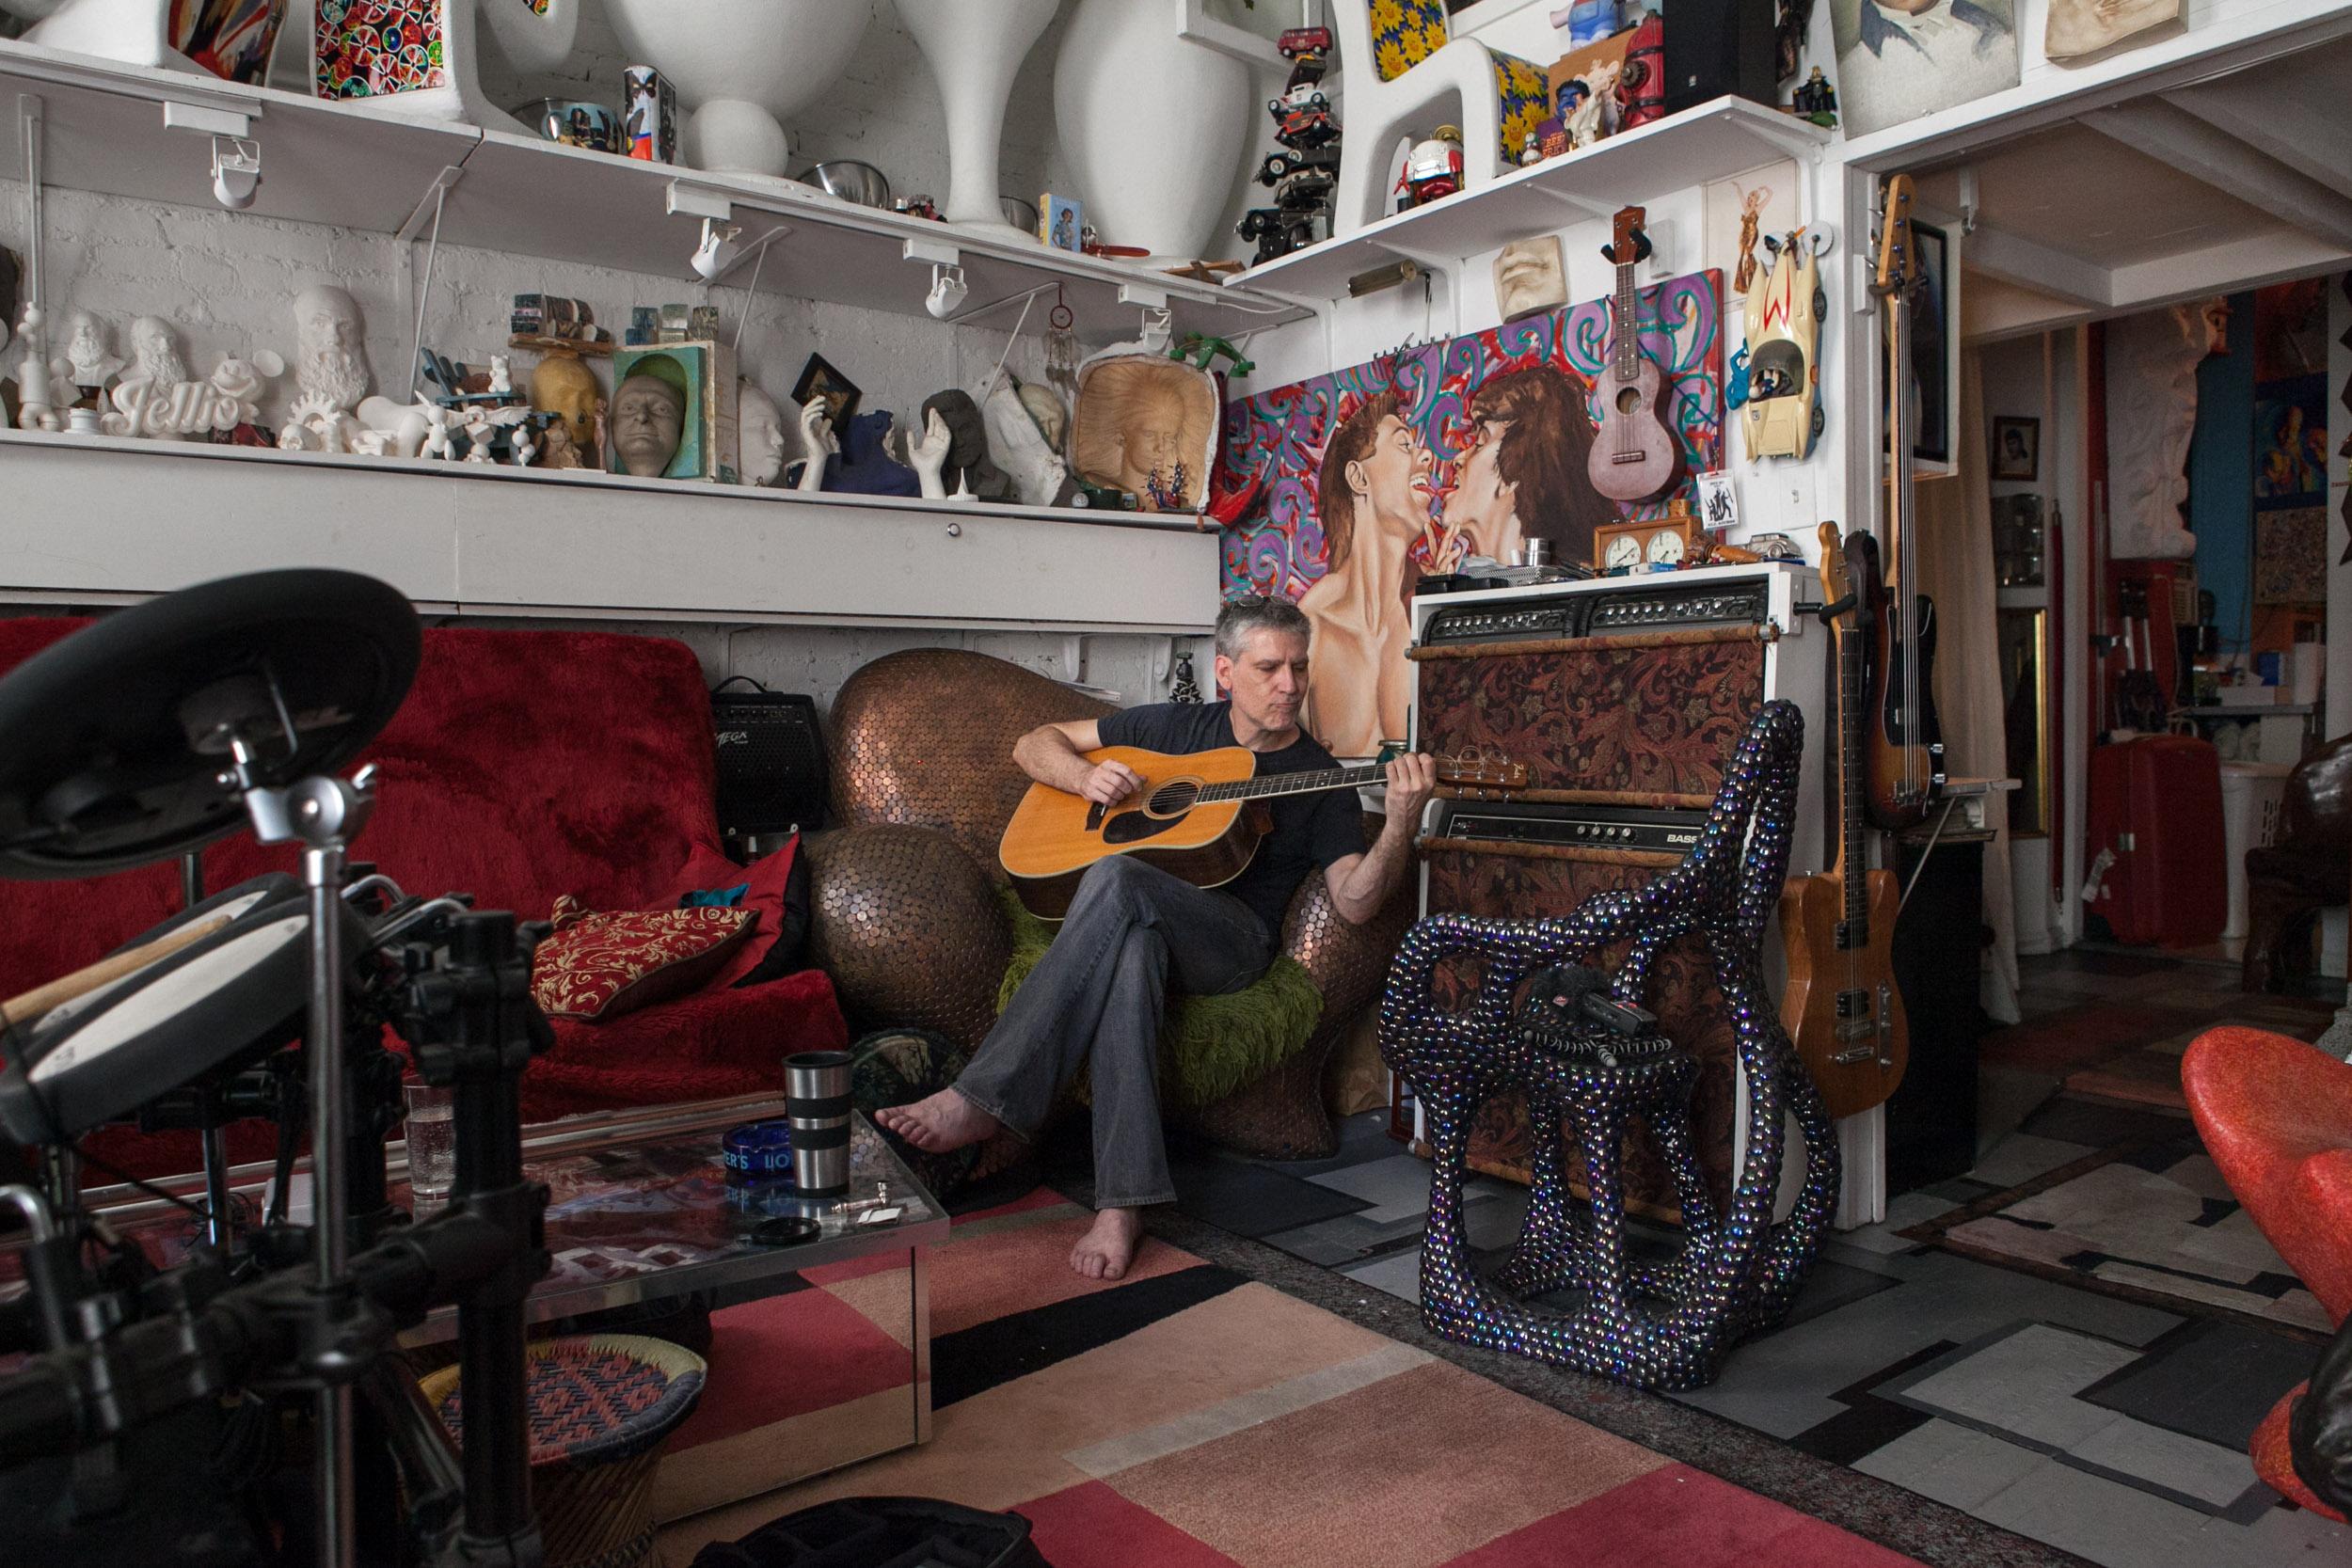 Michael Ferrari-Fontana in his St. Marks Place home. [Emon Hassan/Guitarkadia]